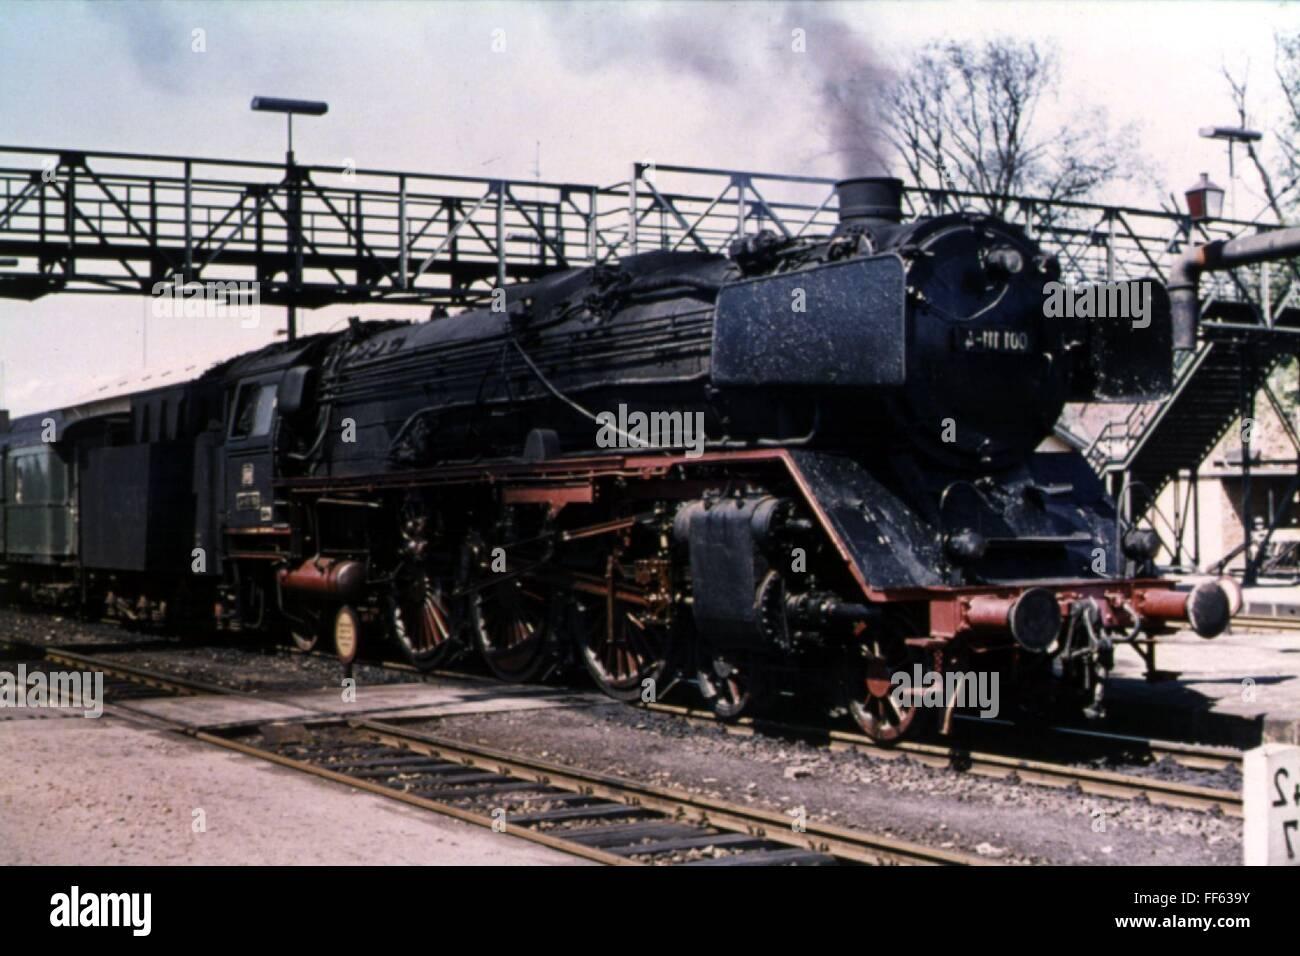 Trasporti / trasporto, ferrovia, locomotive, Lok 001111, BW Hof, vor P 3228 in Schwandorf, 14.6.1973, anni settanta, Foto Stock